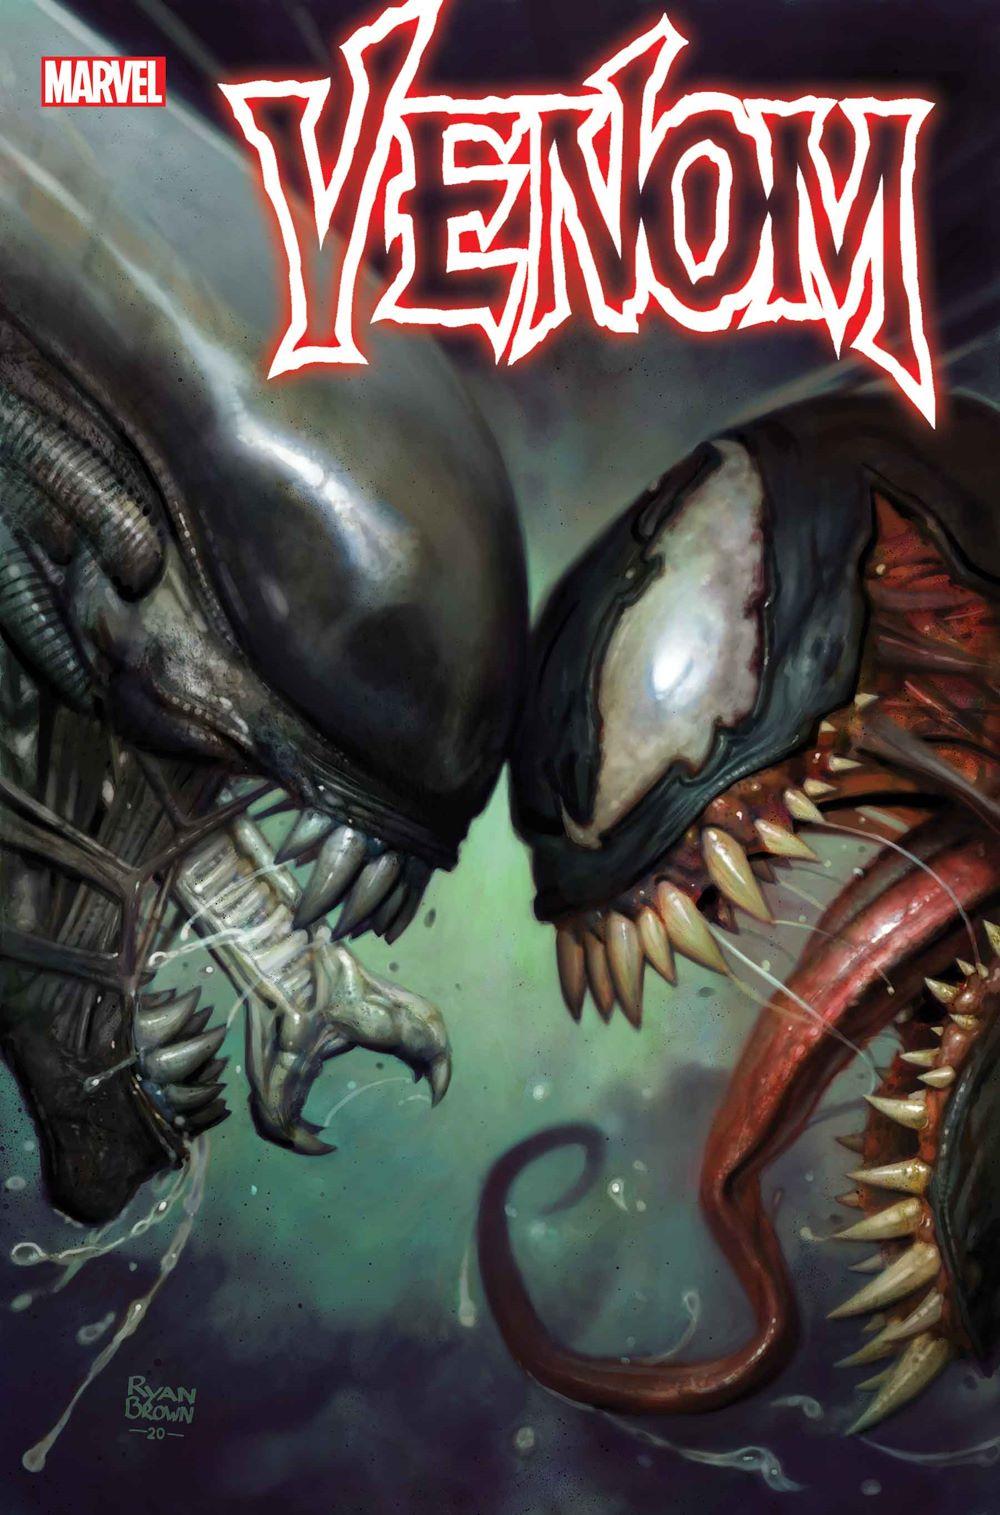 VENOM2018032_BrownVar Marvel Comics January 2021 Solicitations